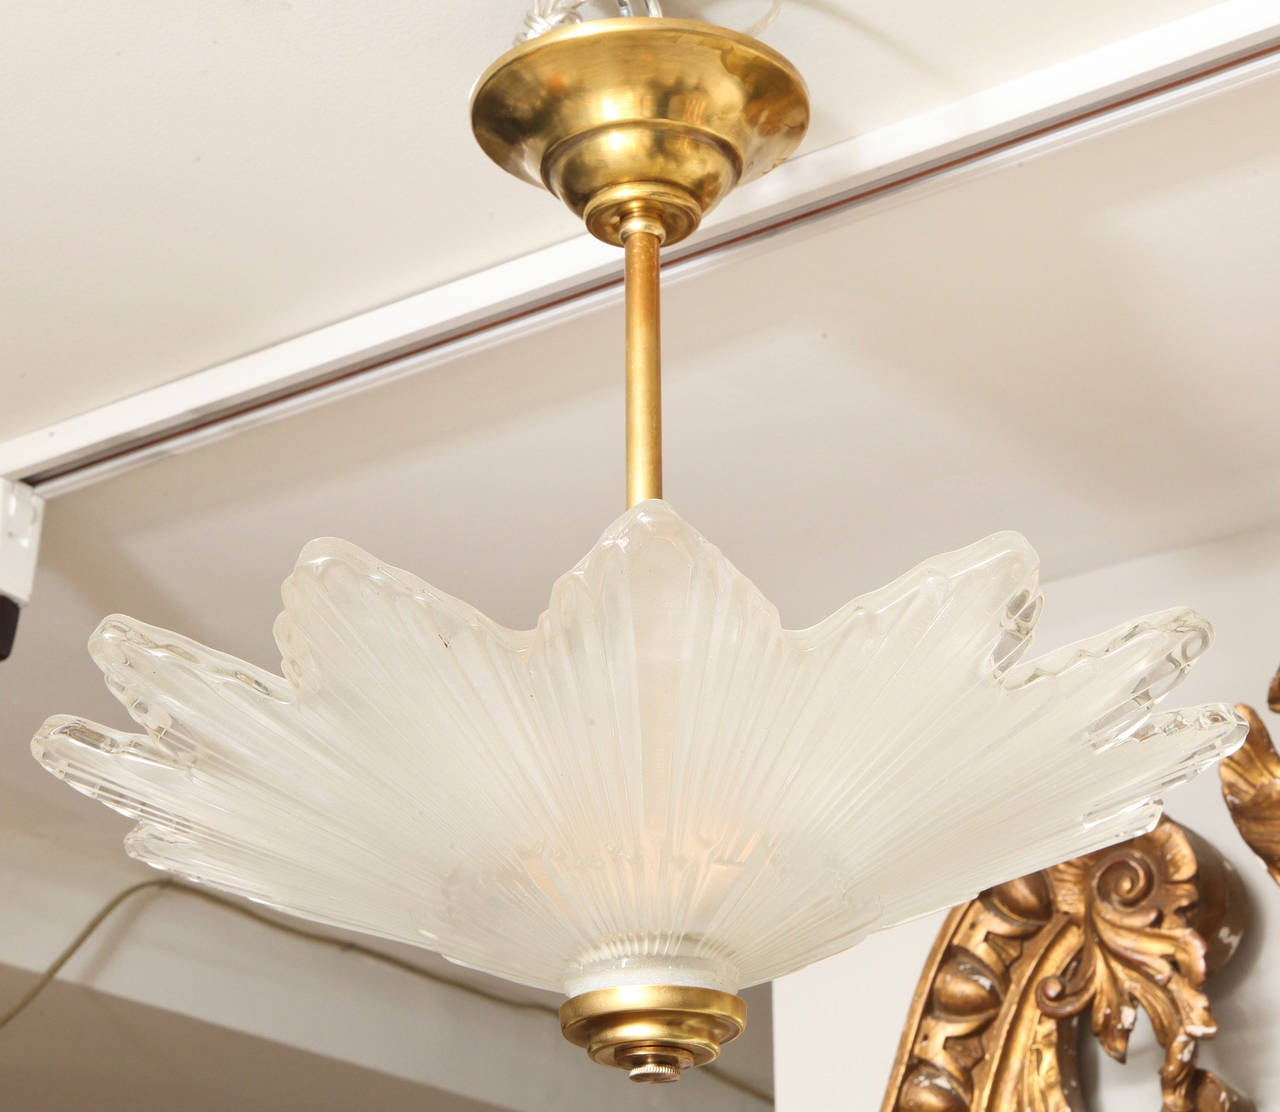 Caldwell Scalloped Edged Glass Sunburst Ceiling Light at ...